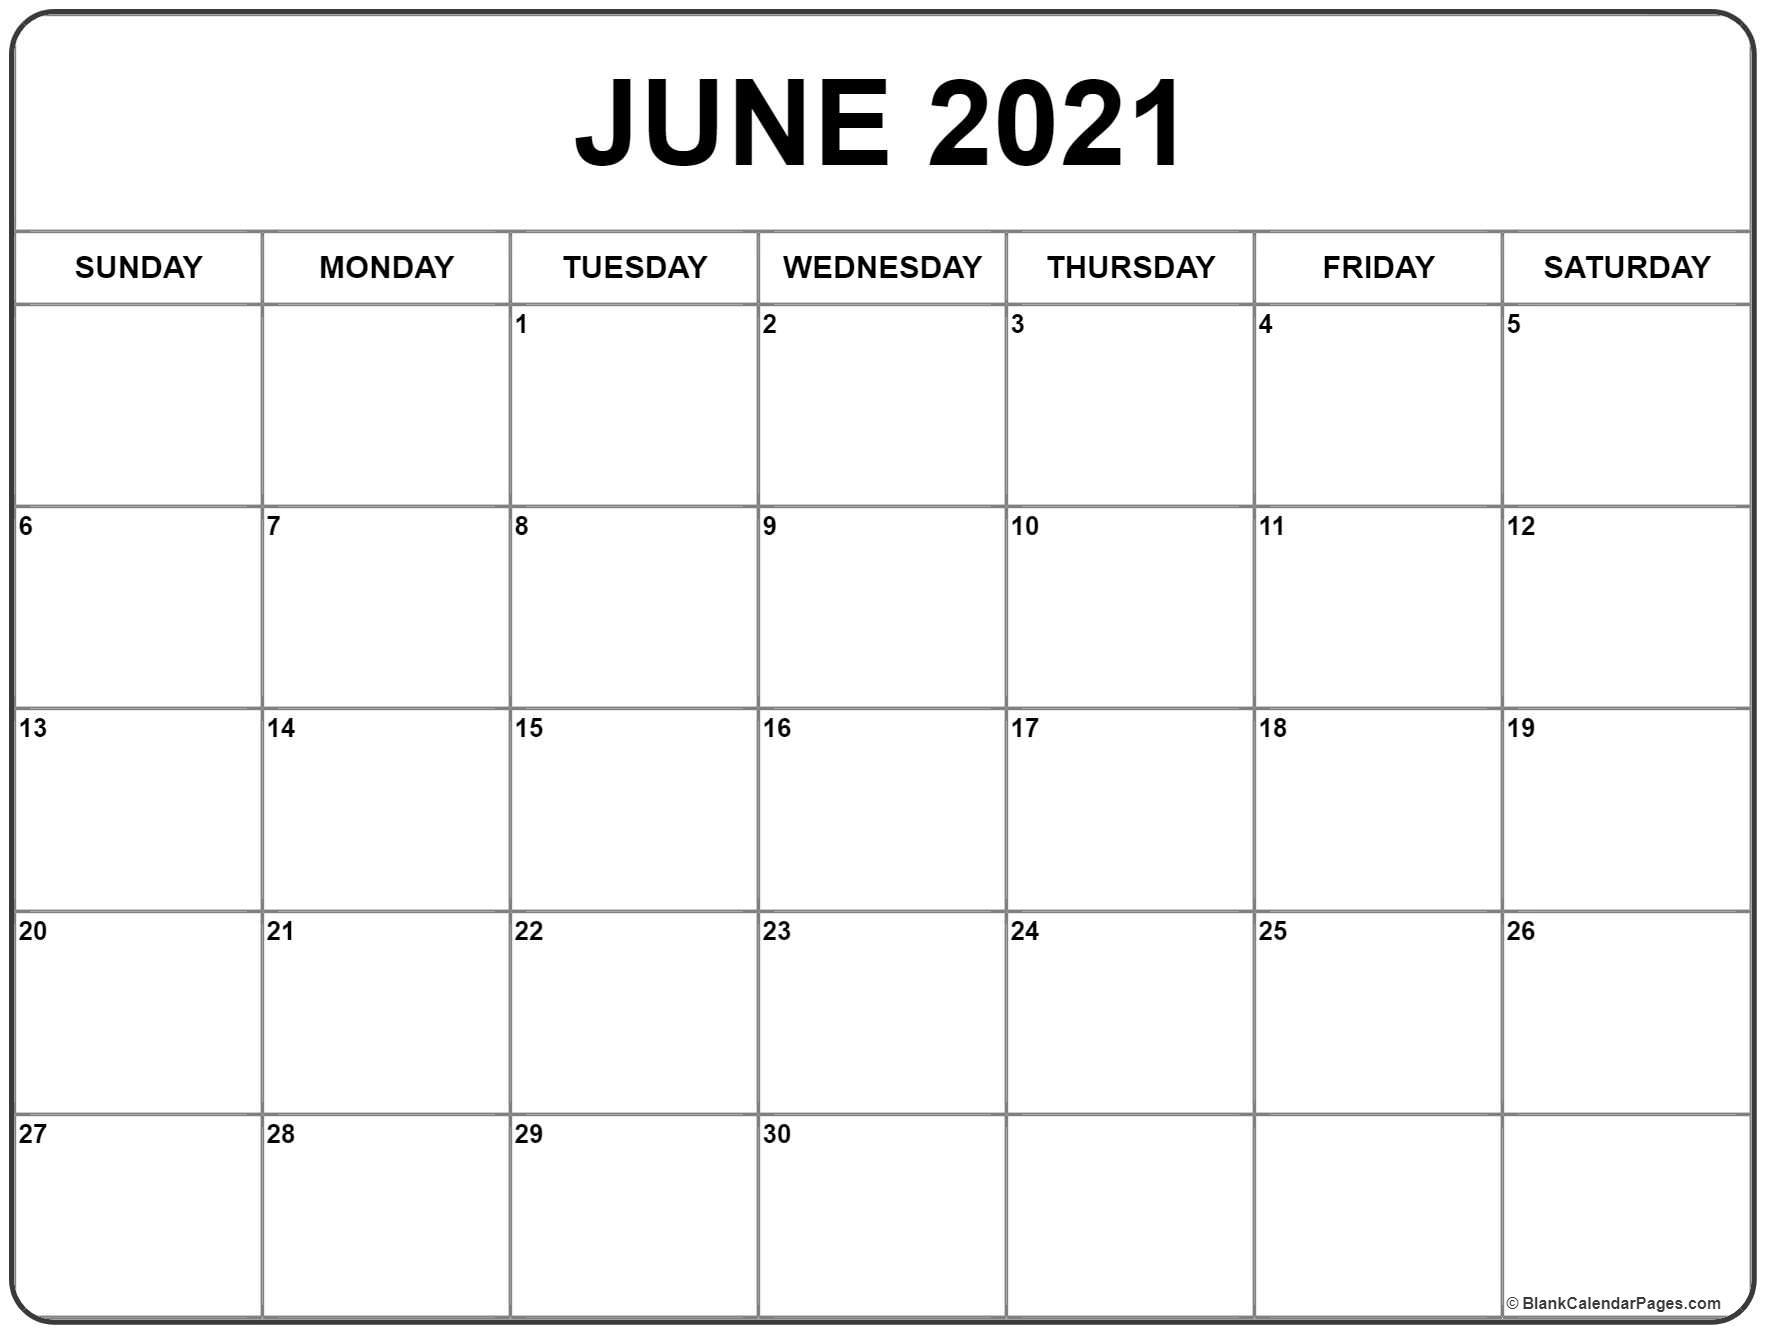 June 2021 Calendar | 51+ Calendar Templates Of 2021 Calendars June 2021 Calendar Kuda